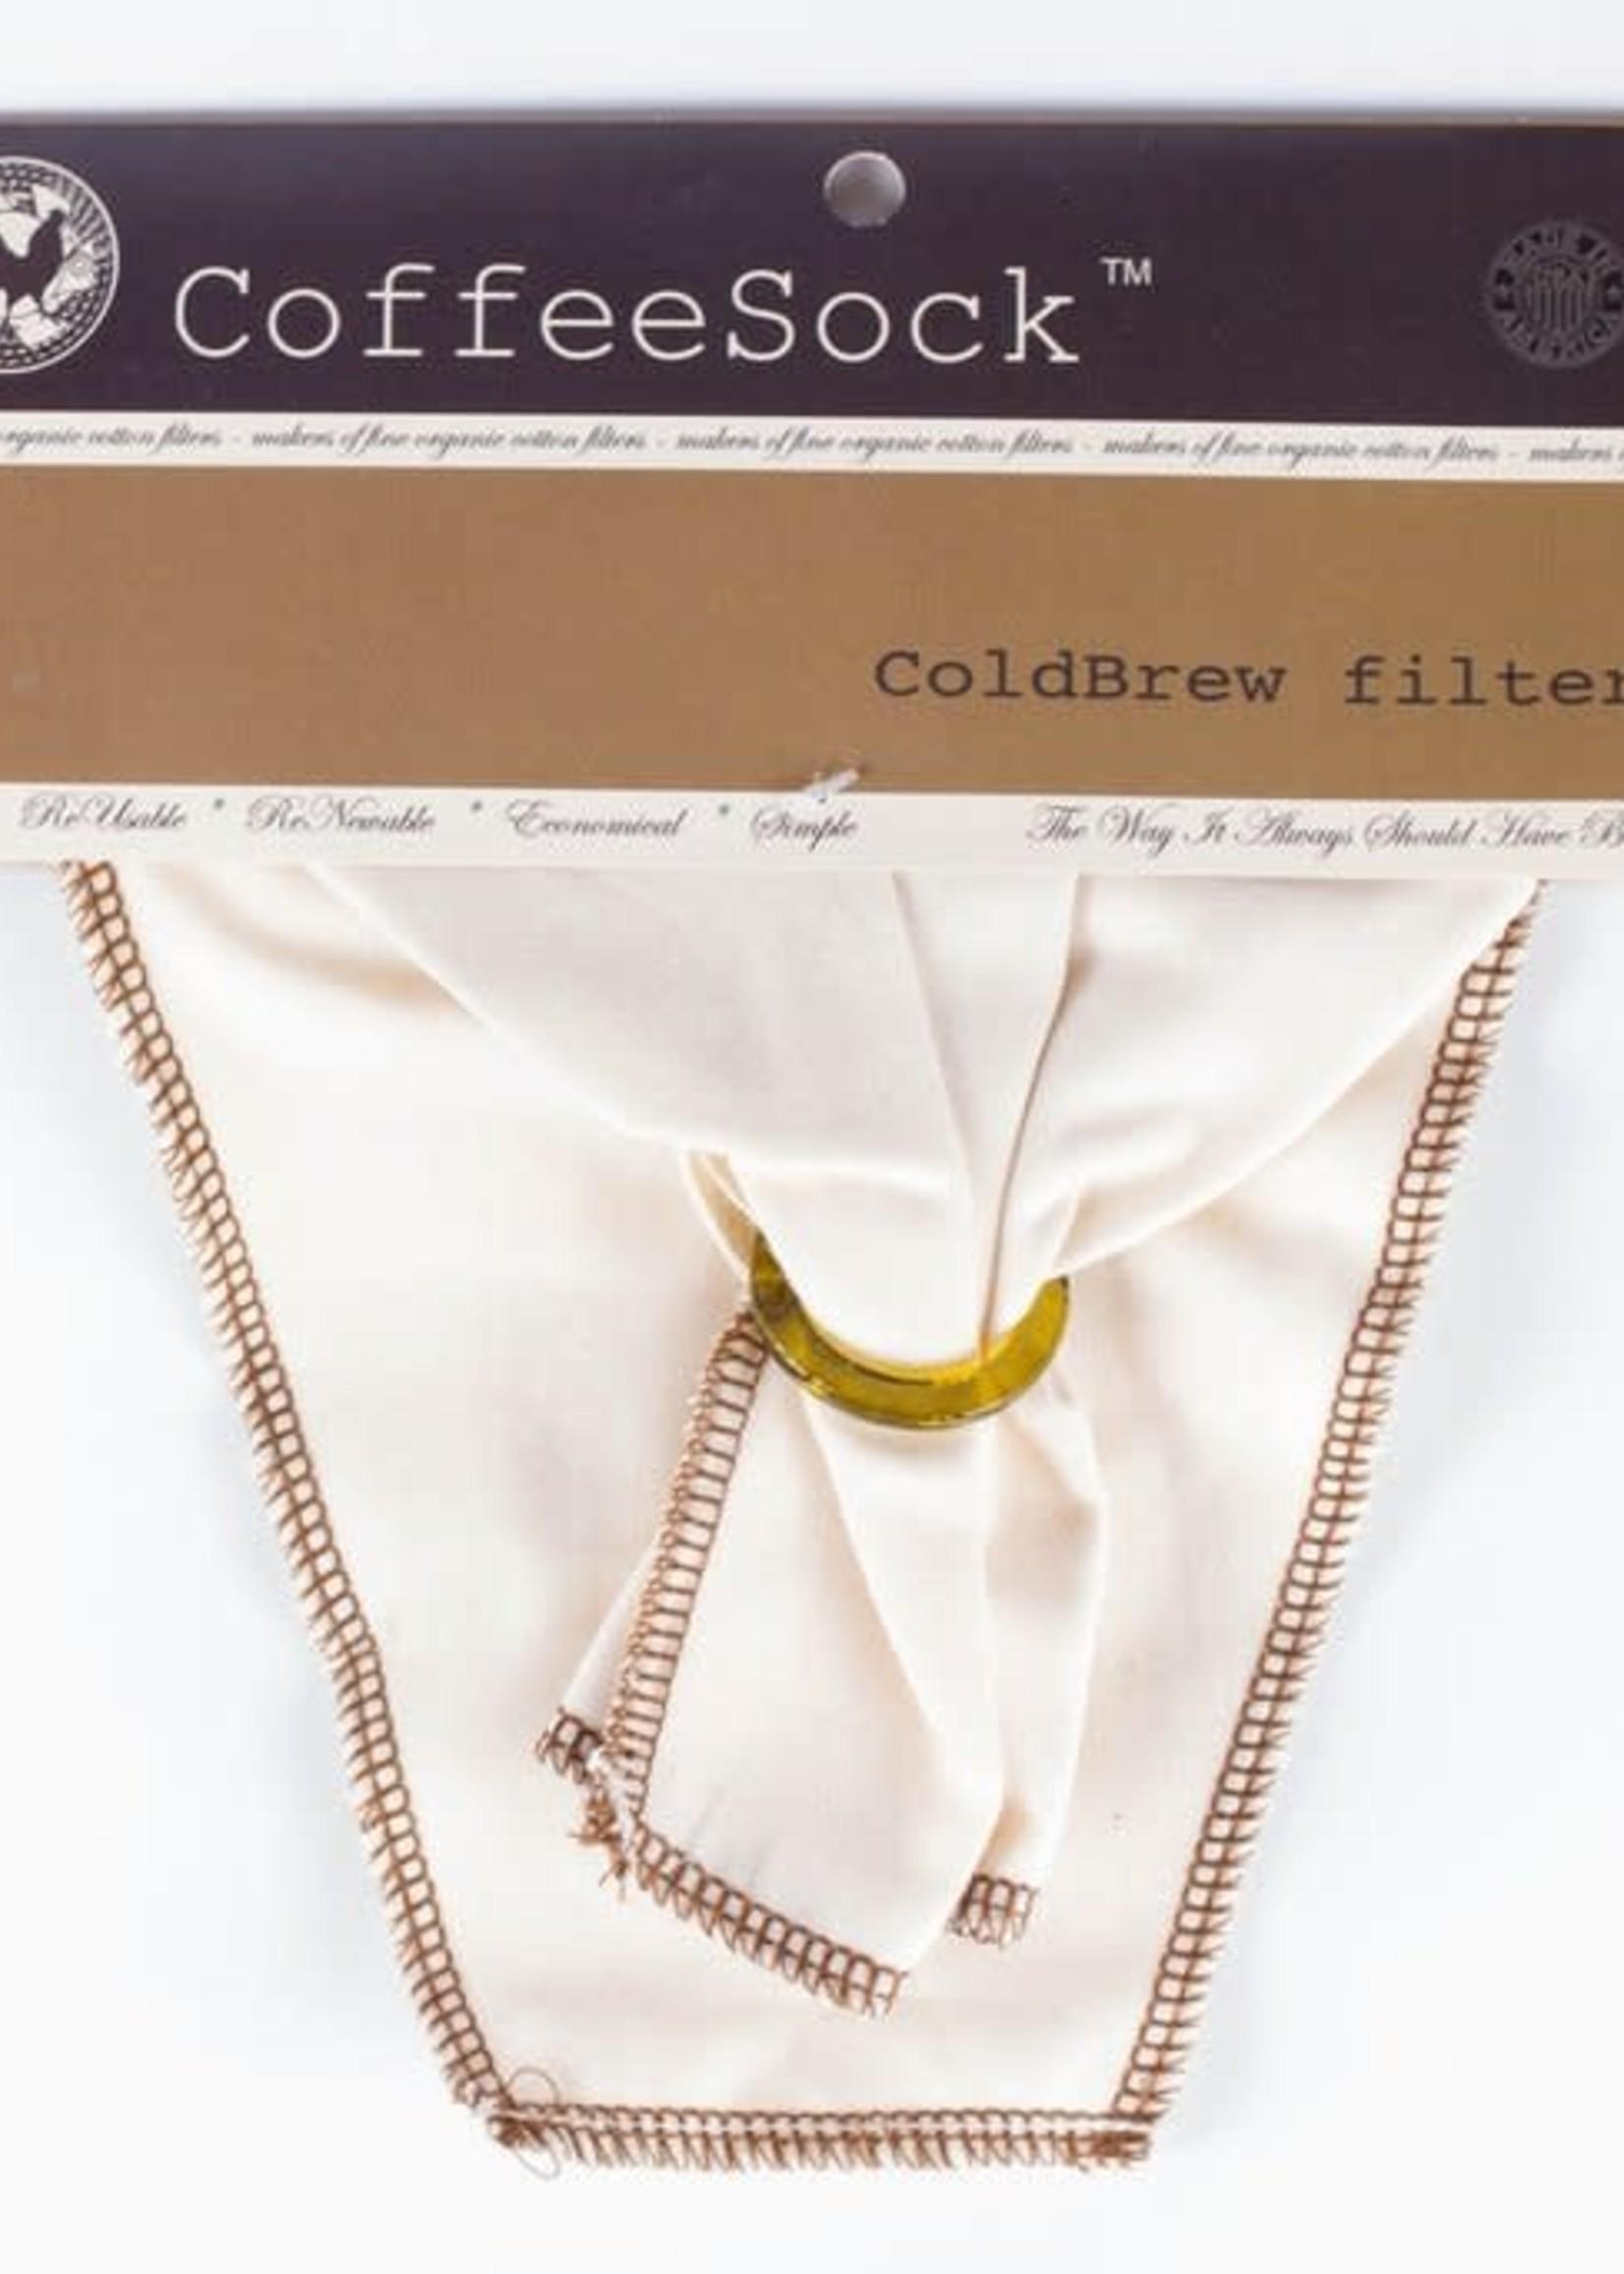 CoffeeSock CoffeeSock Cold Brew Filter  64oz